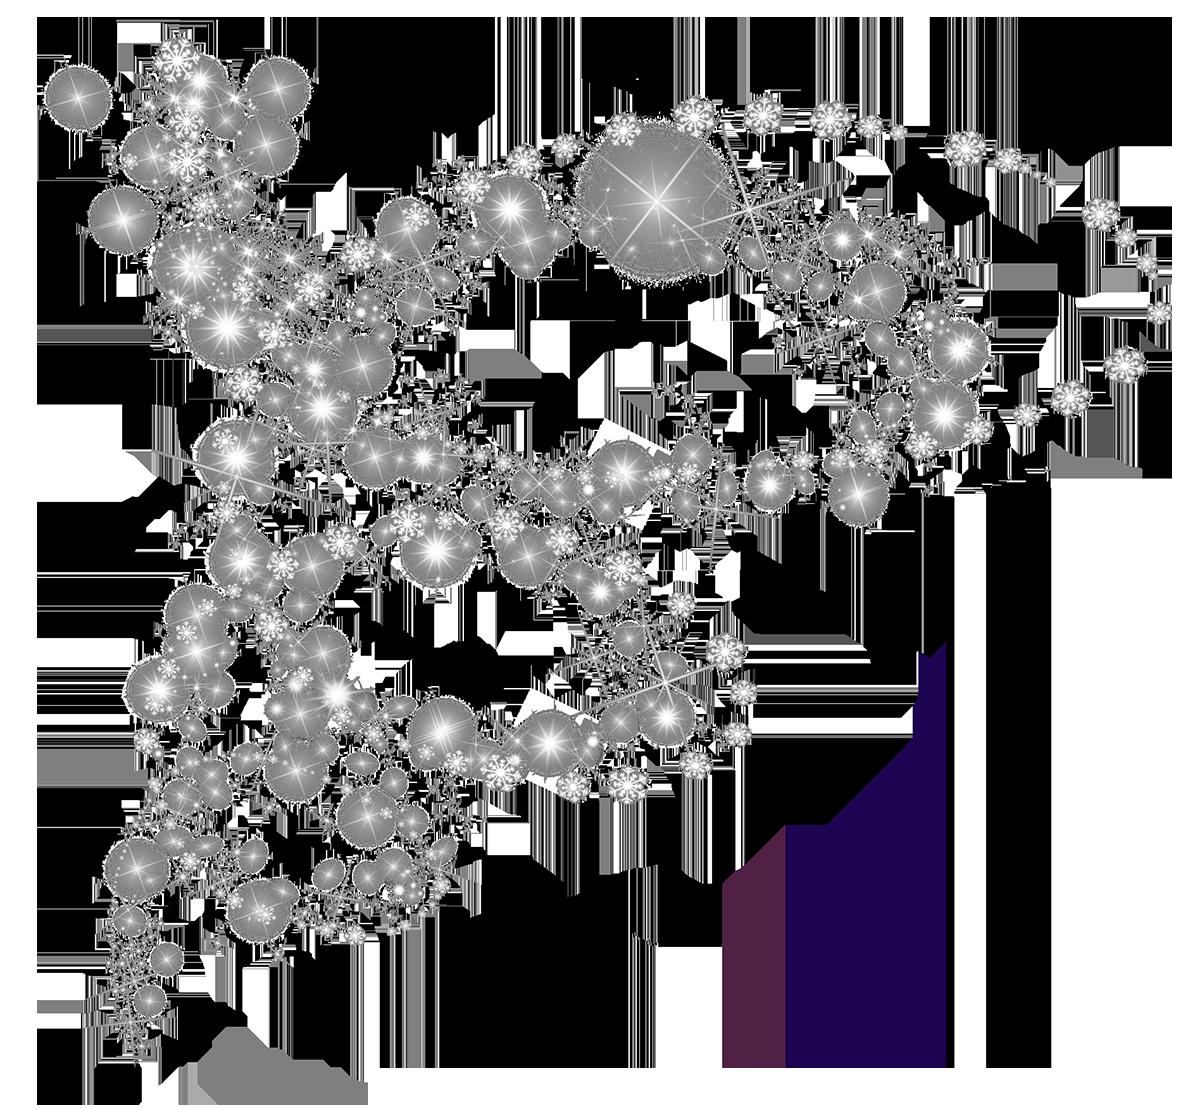 Snowflakes PNG - 6126